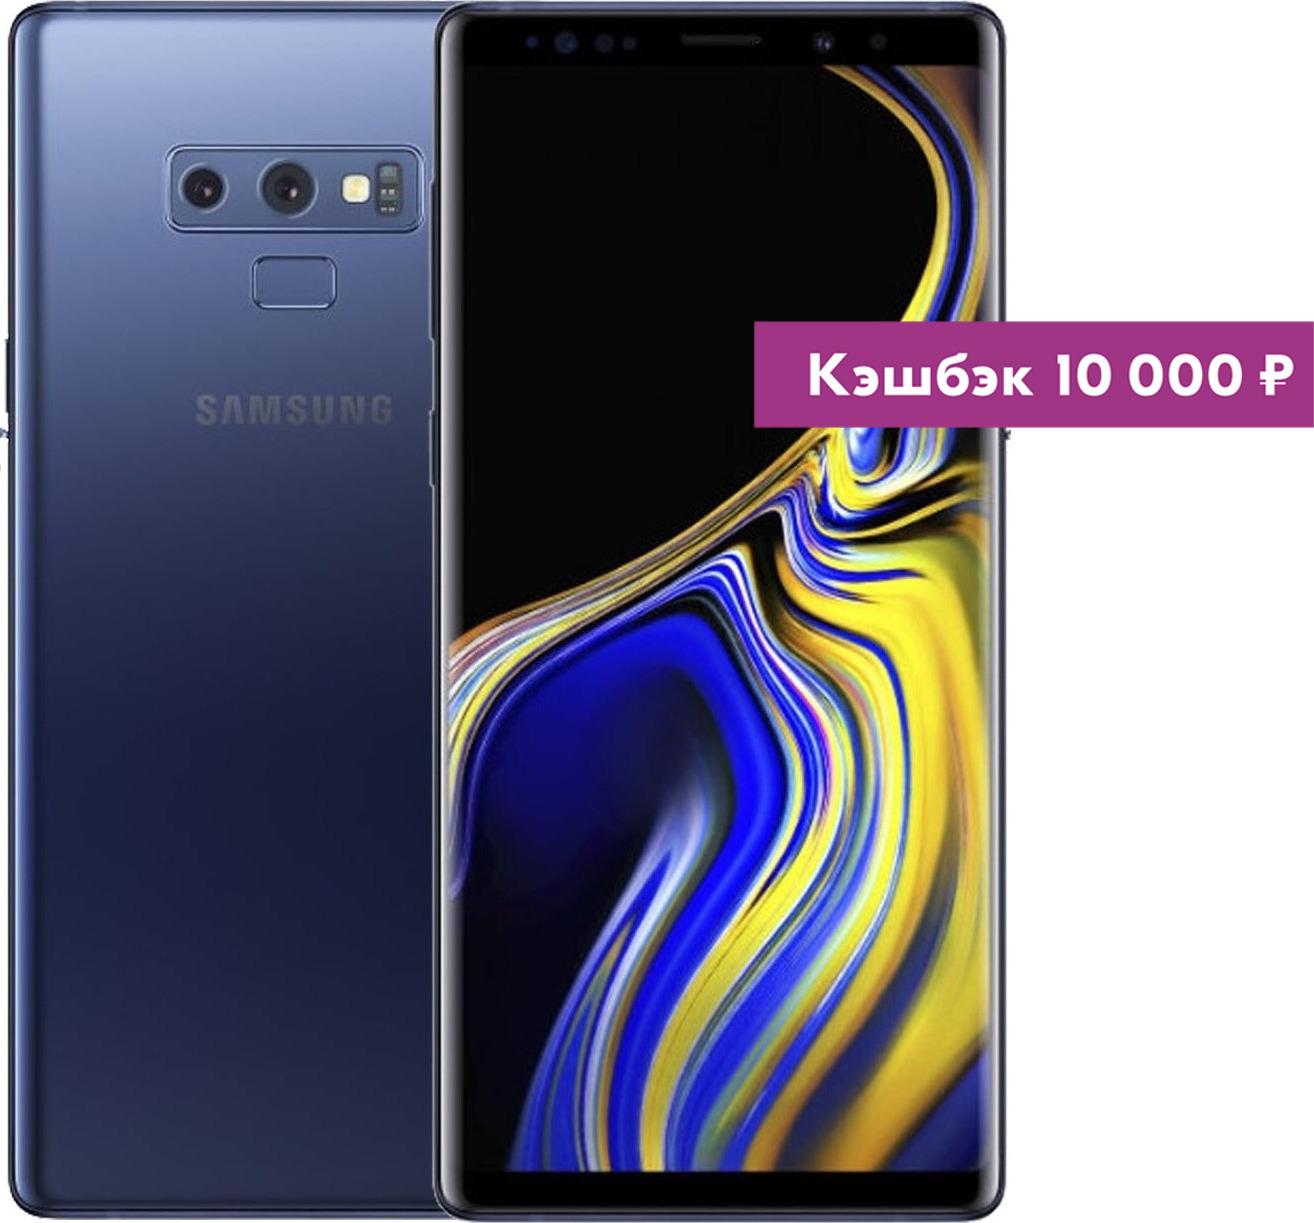 Смартфон Samsung Galaxy Note9 8/512GB blue смартфон motorola xt1925 5 g6 32gb 3gb синий моноблок 3g 4g 2sim 5 7 1080x2160 android 8 0 12mpix 802 11abgnac bt gps gsm900 1800 gsm1900 touchsc ptotect mp3 a gps microsd max128gb